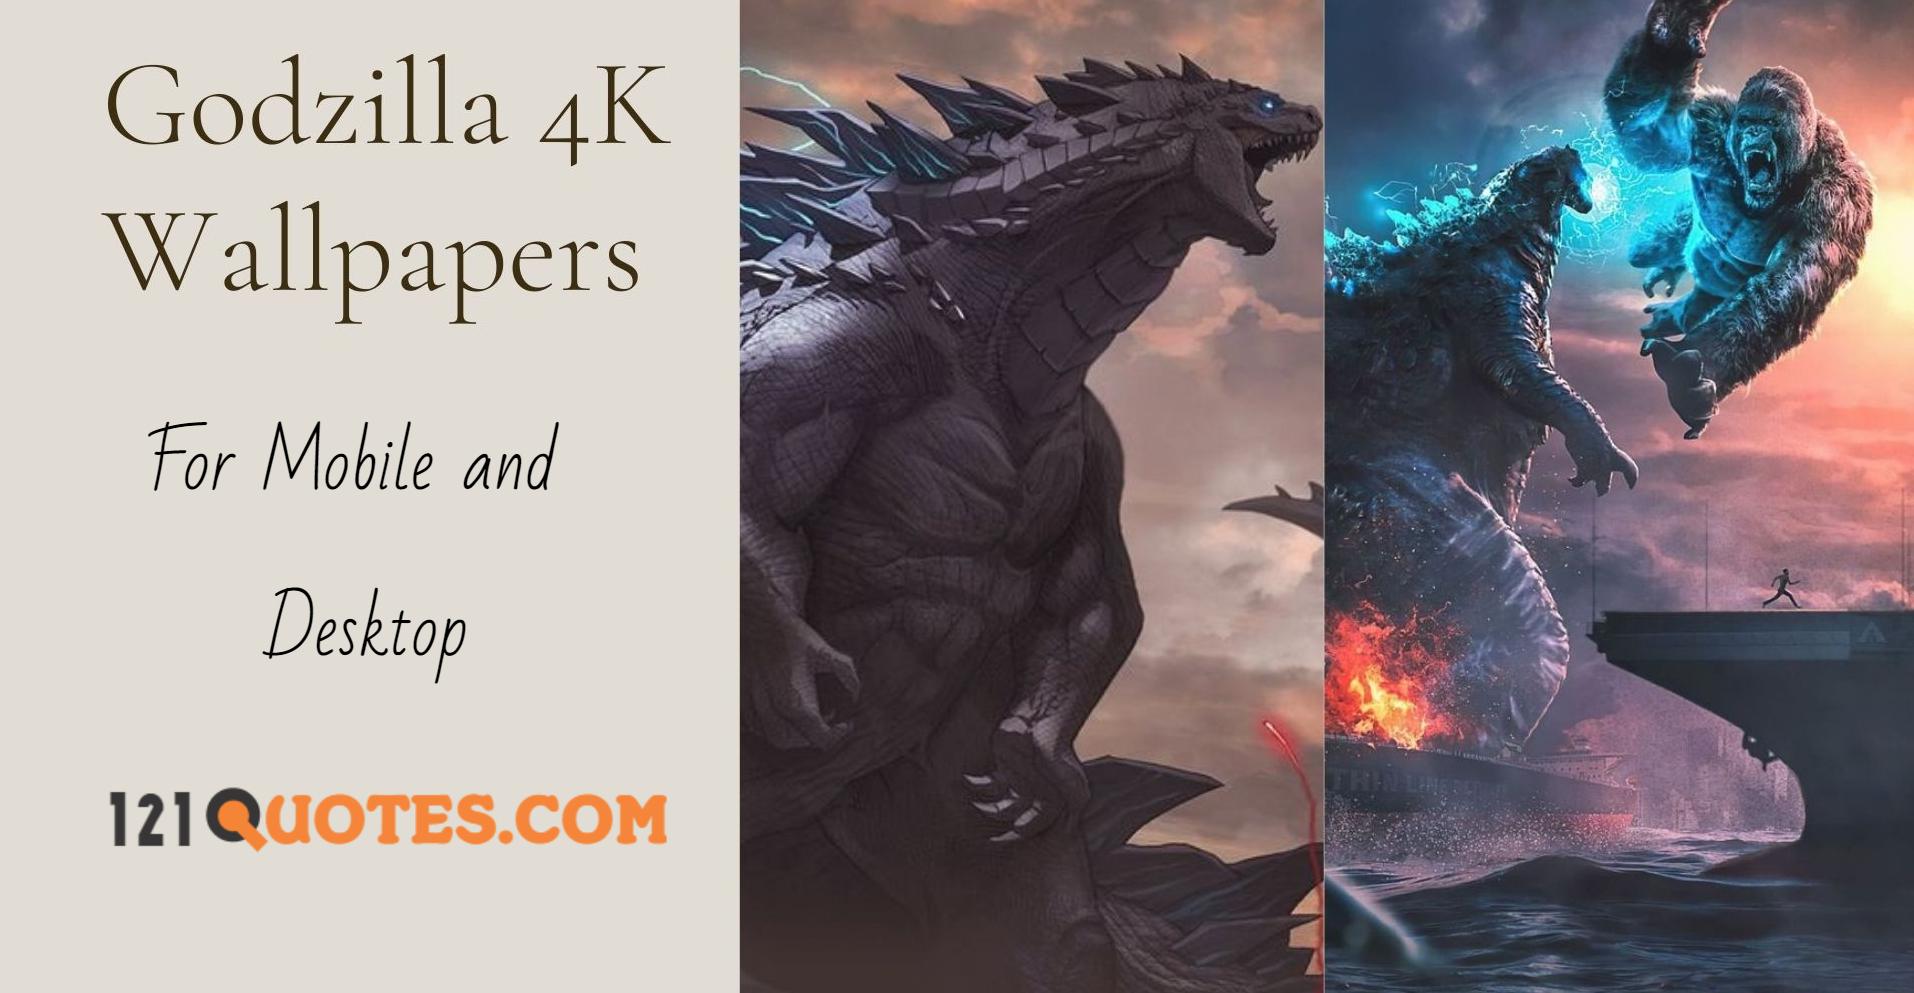 Godzilla 4K Wallpapers